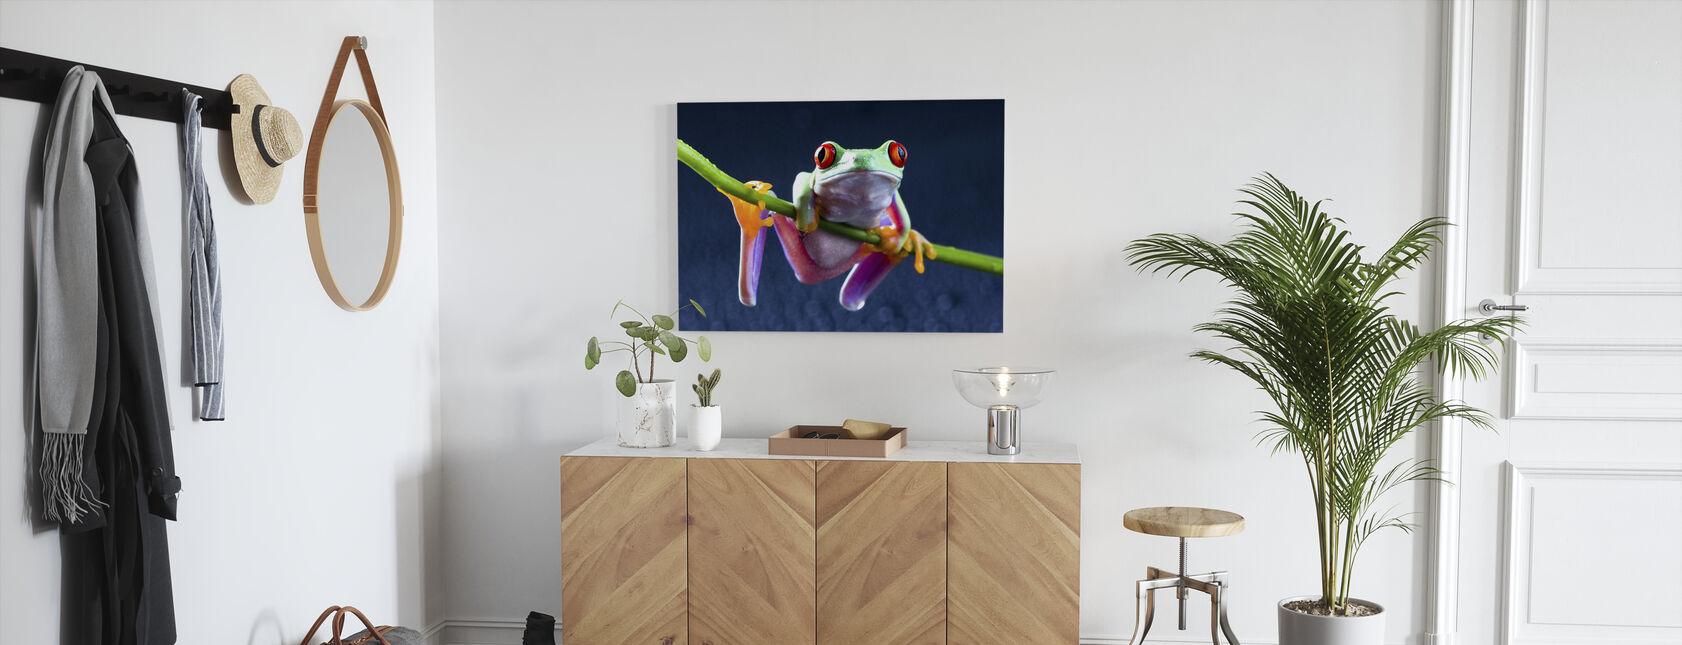 Rode kikker - Canvas print - Gang